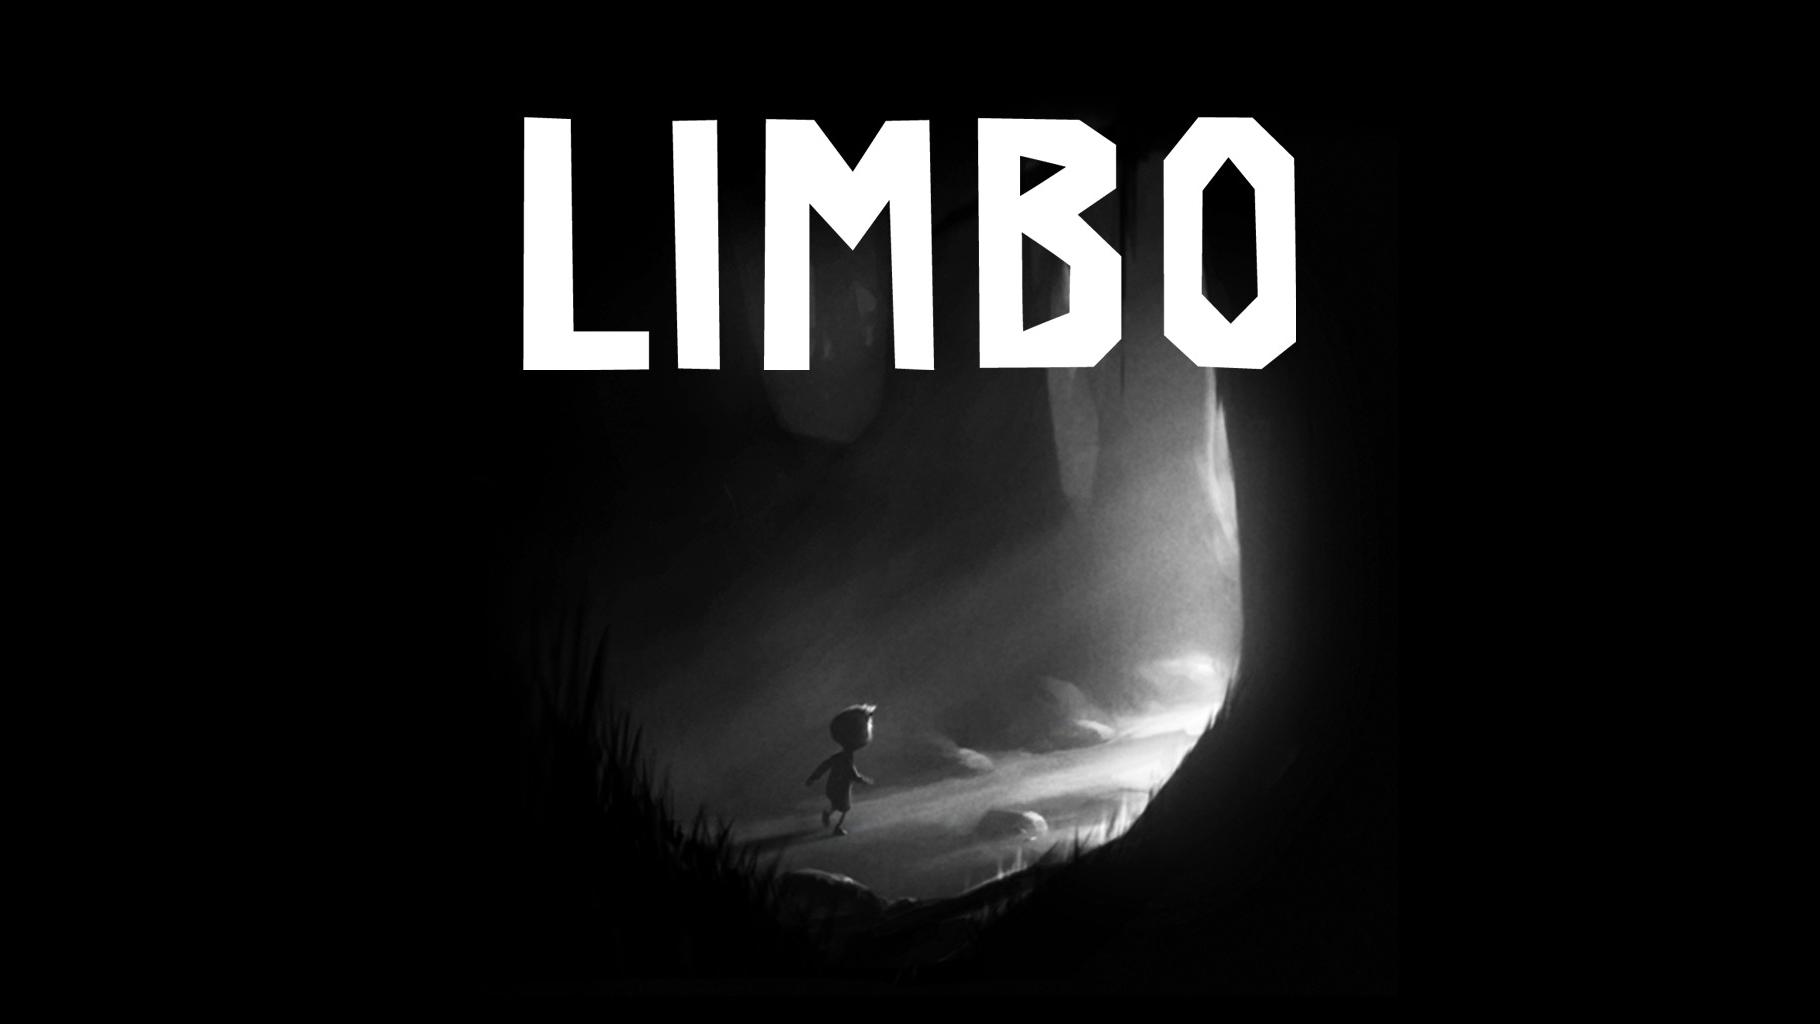 Download the Premium Limbo Apk Mod For Free